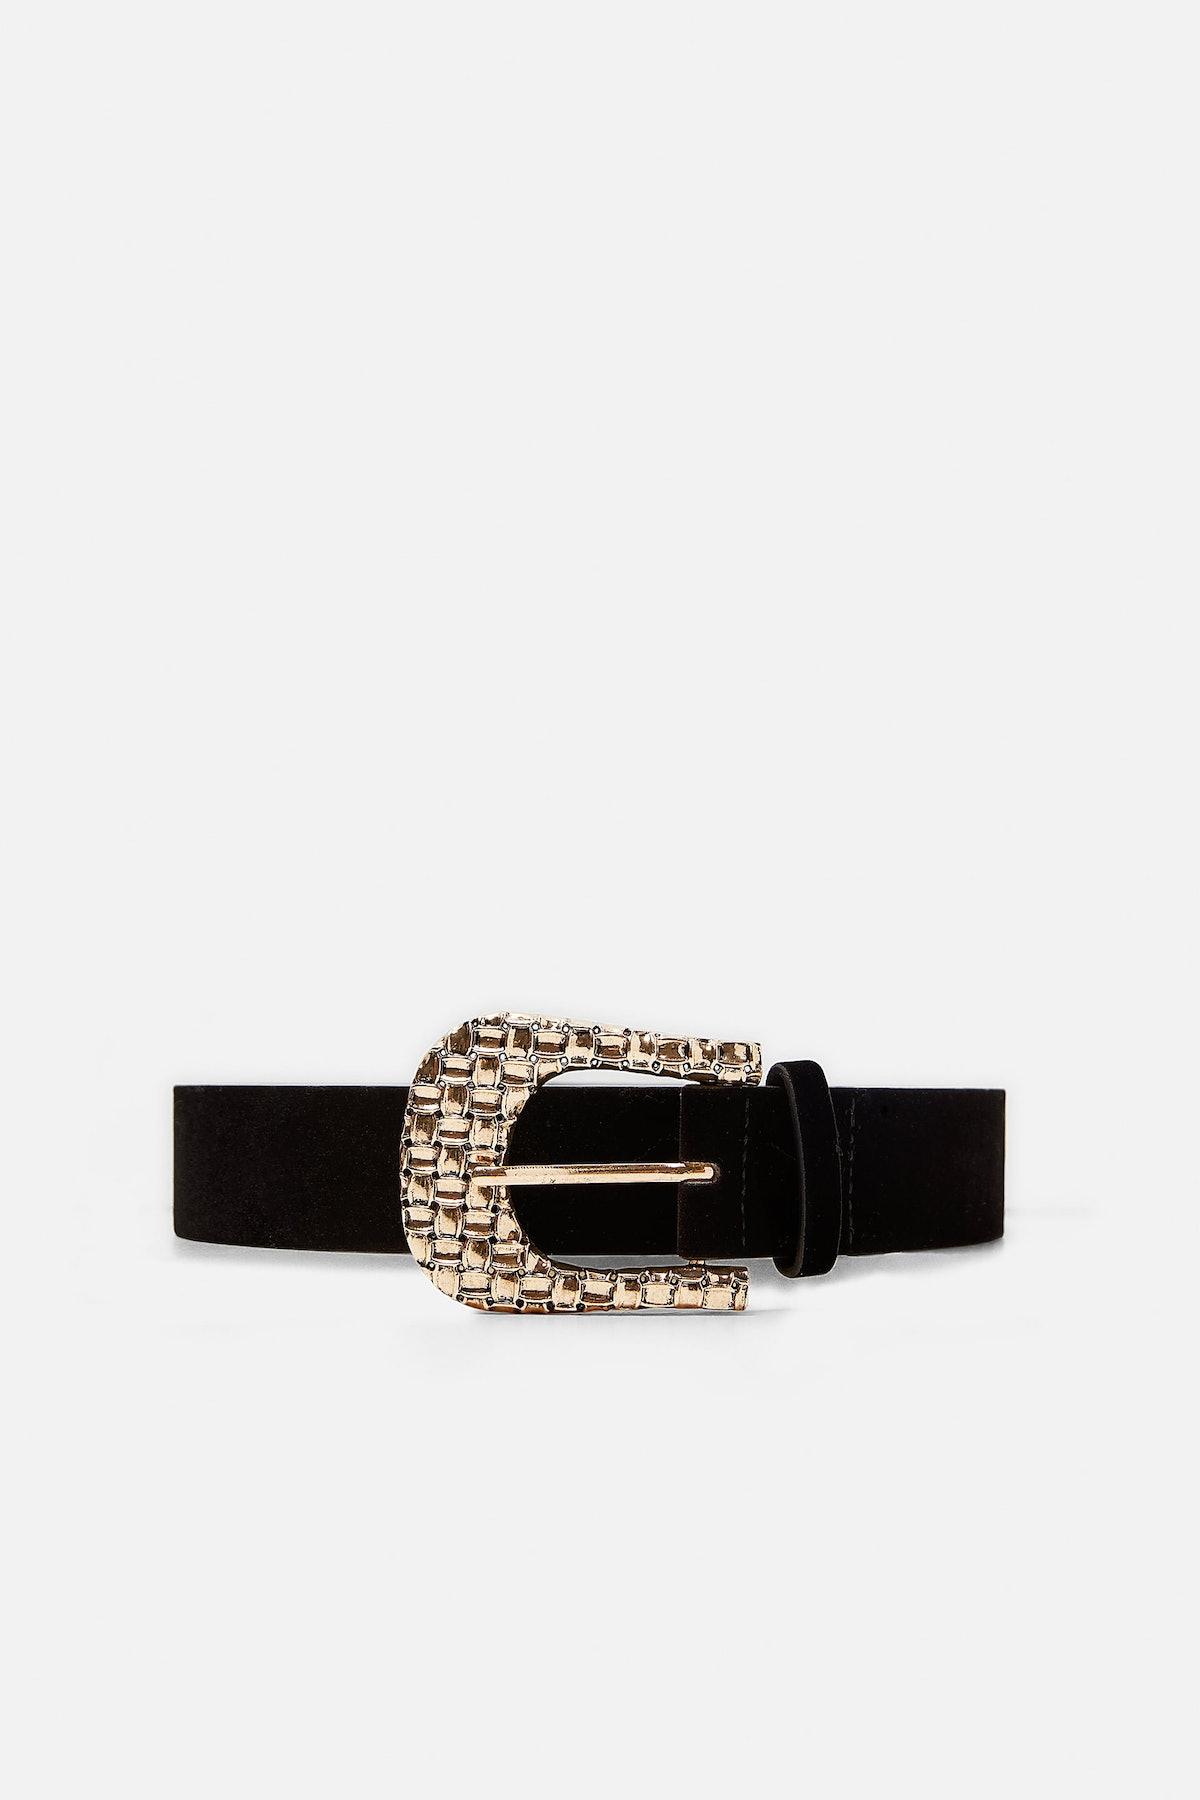 Velvet Belt With Scrolled Buckle